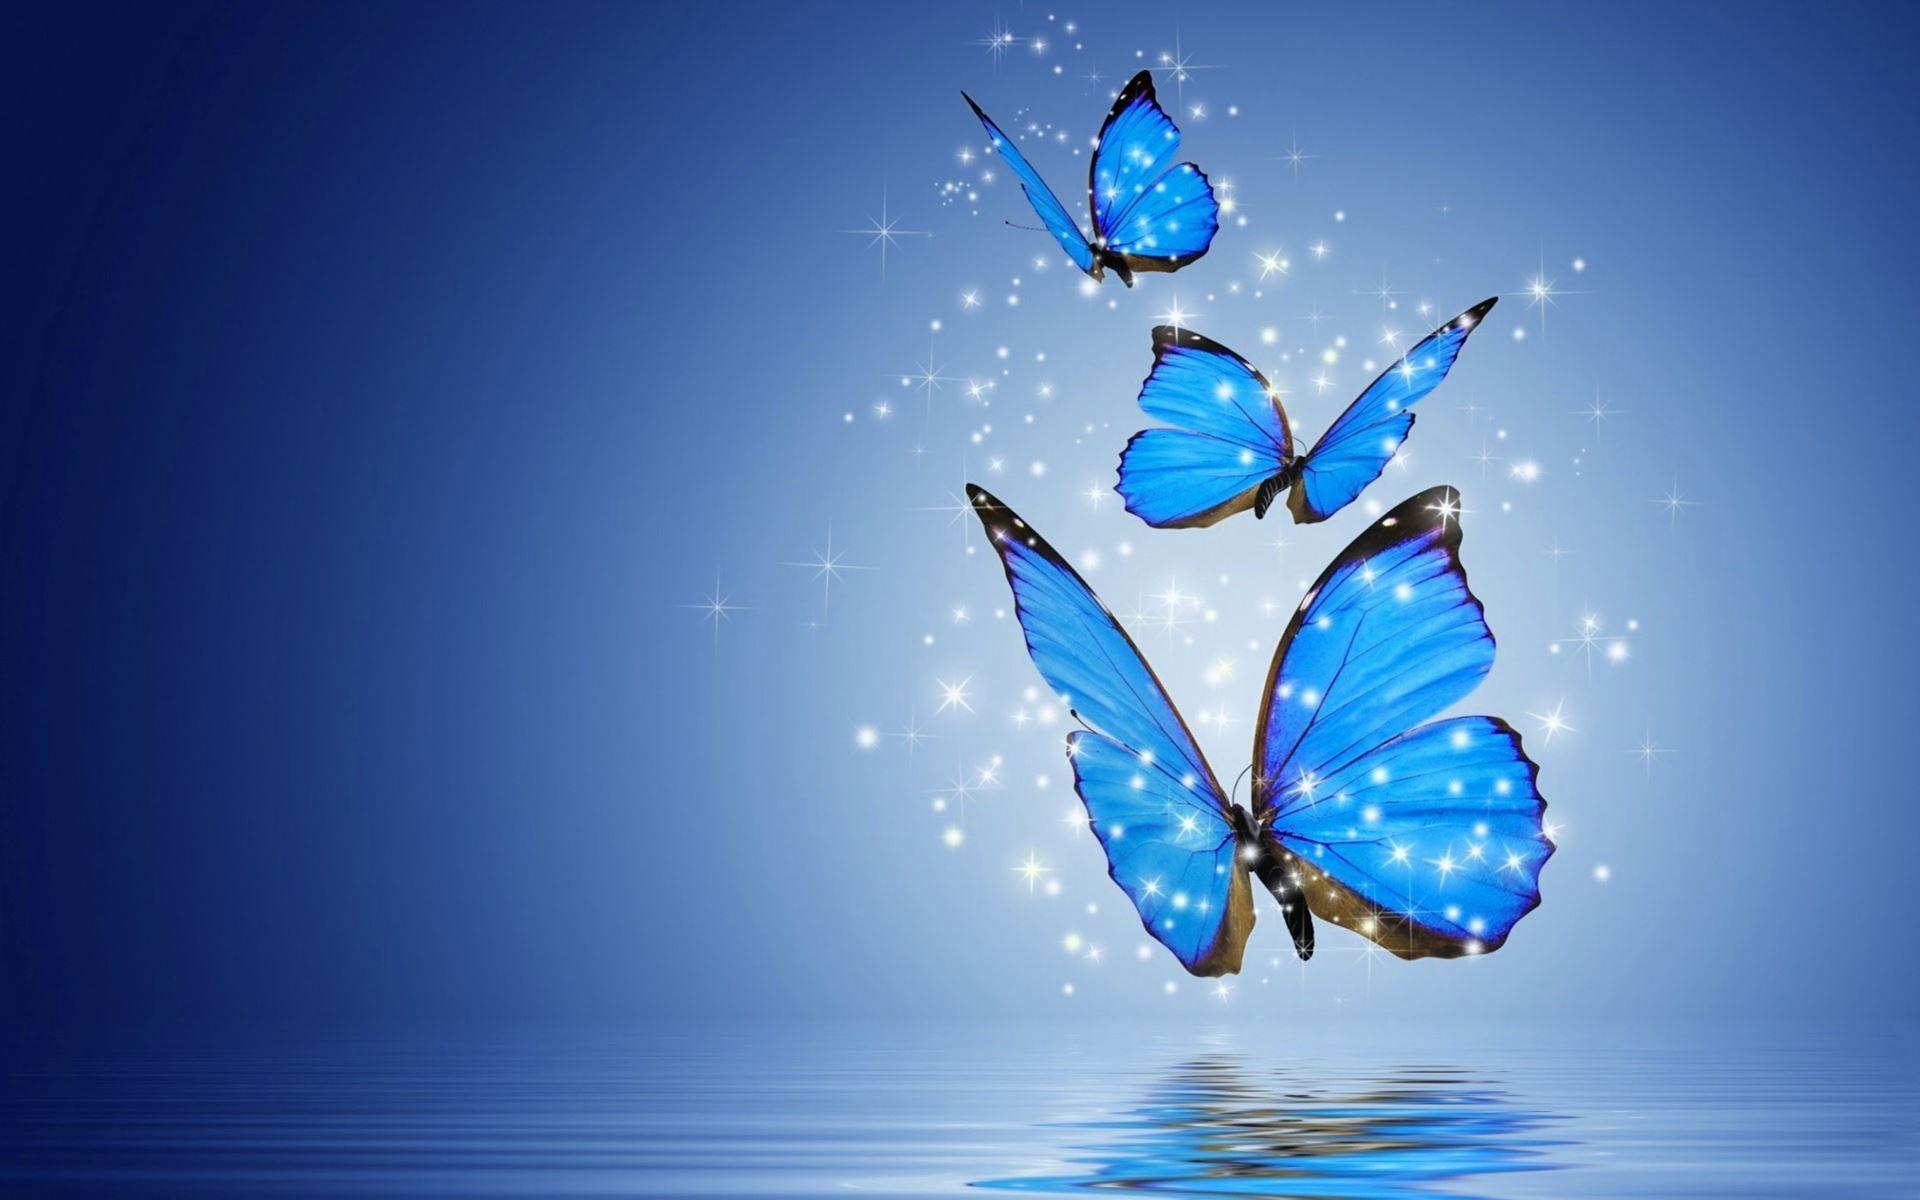 Free Download Hd Wallpapers For Desktop Butterflies Backgrounds